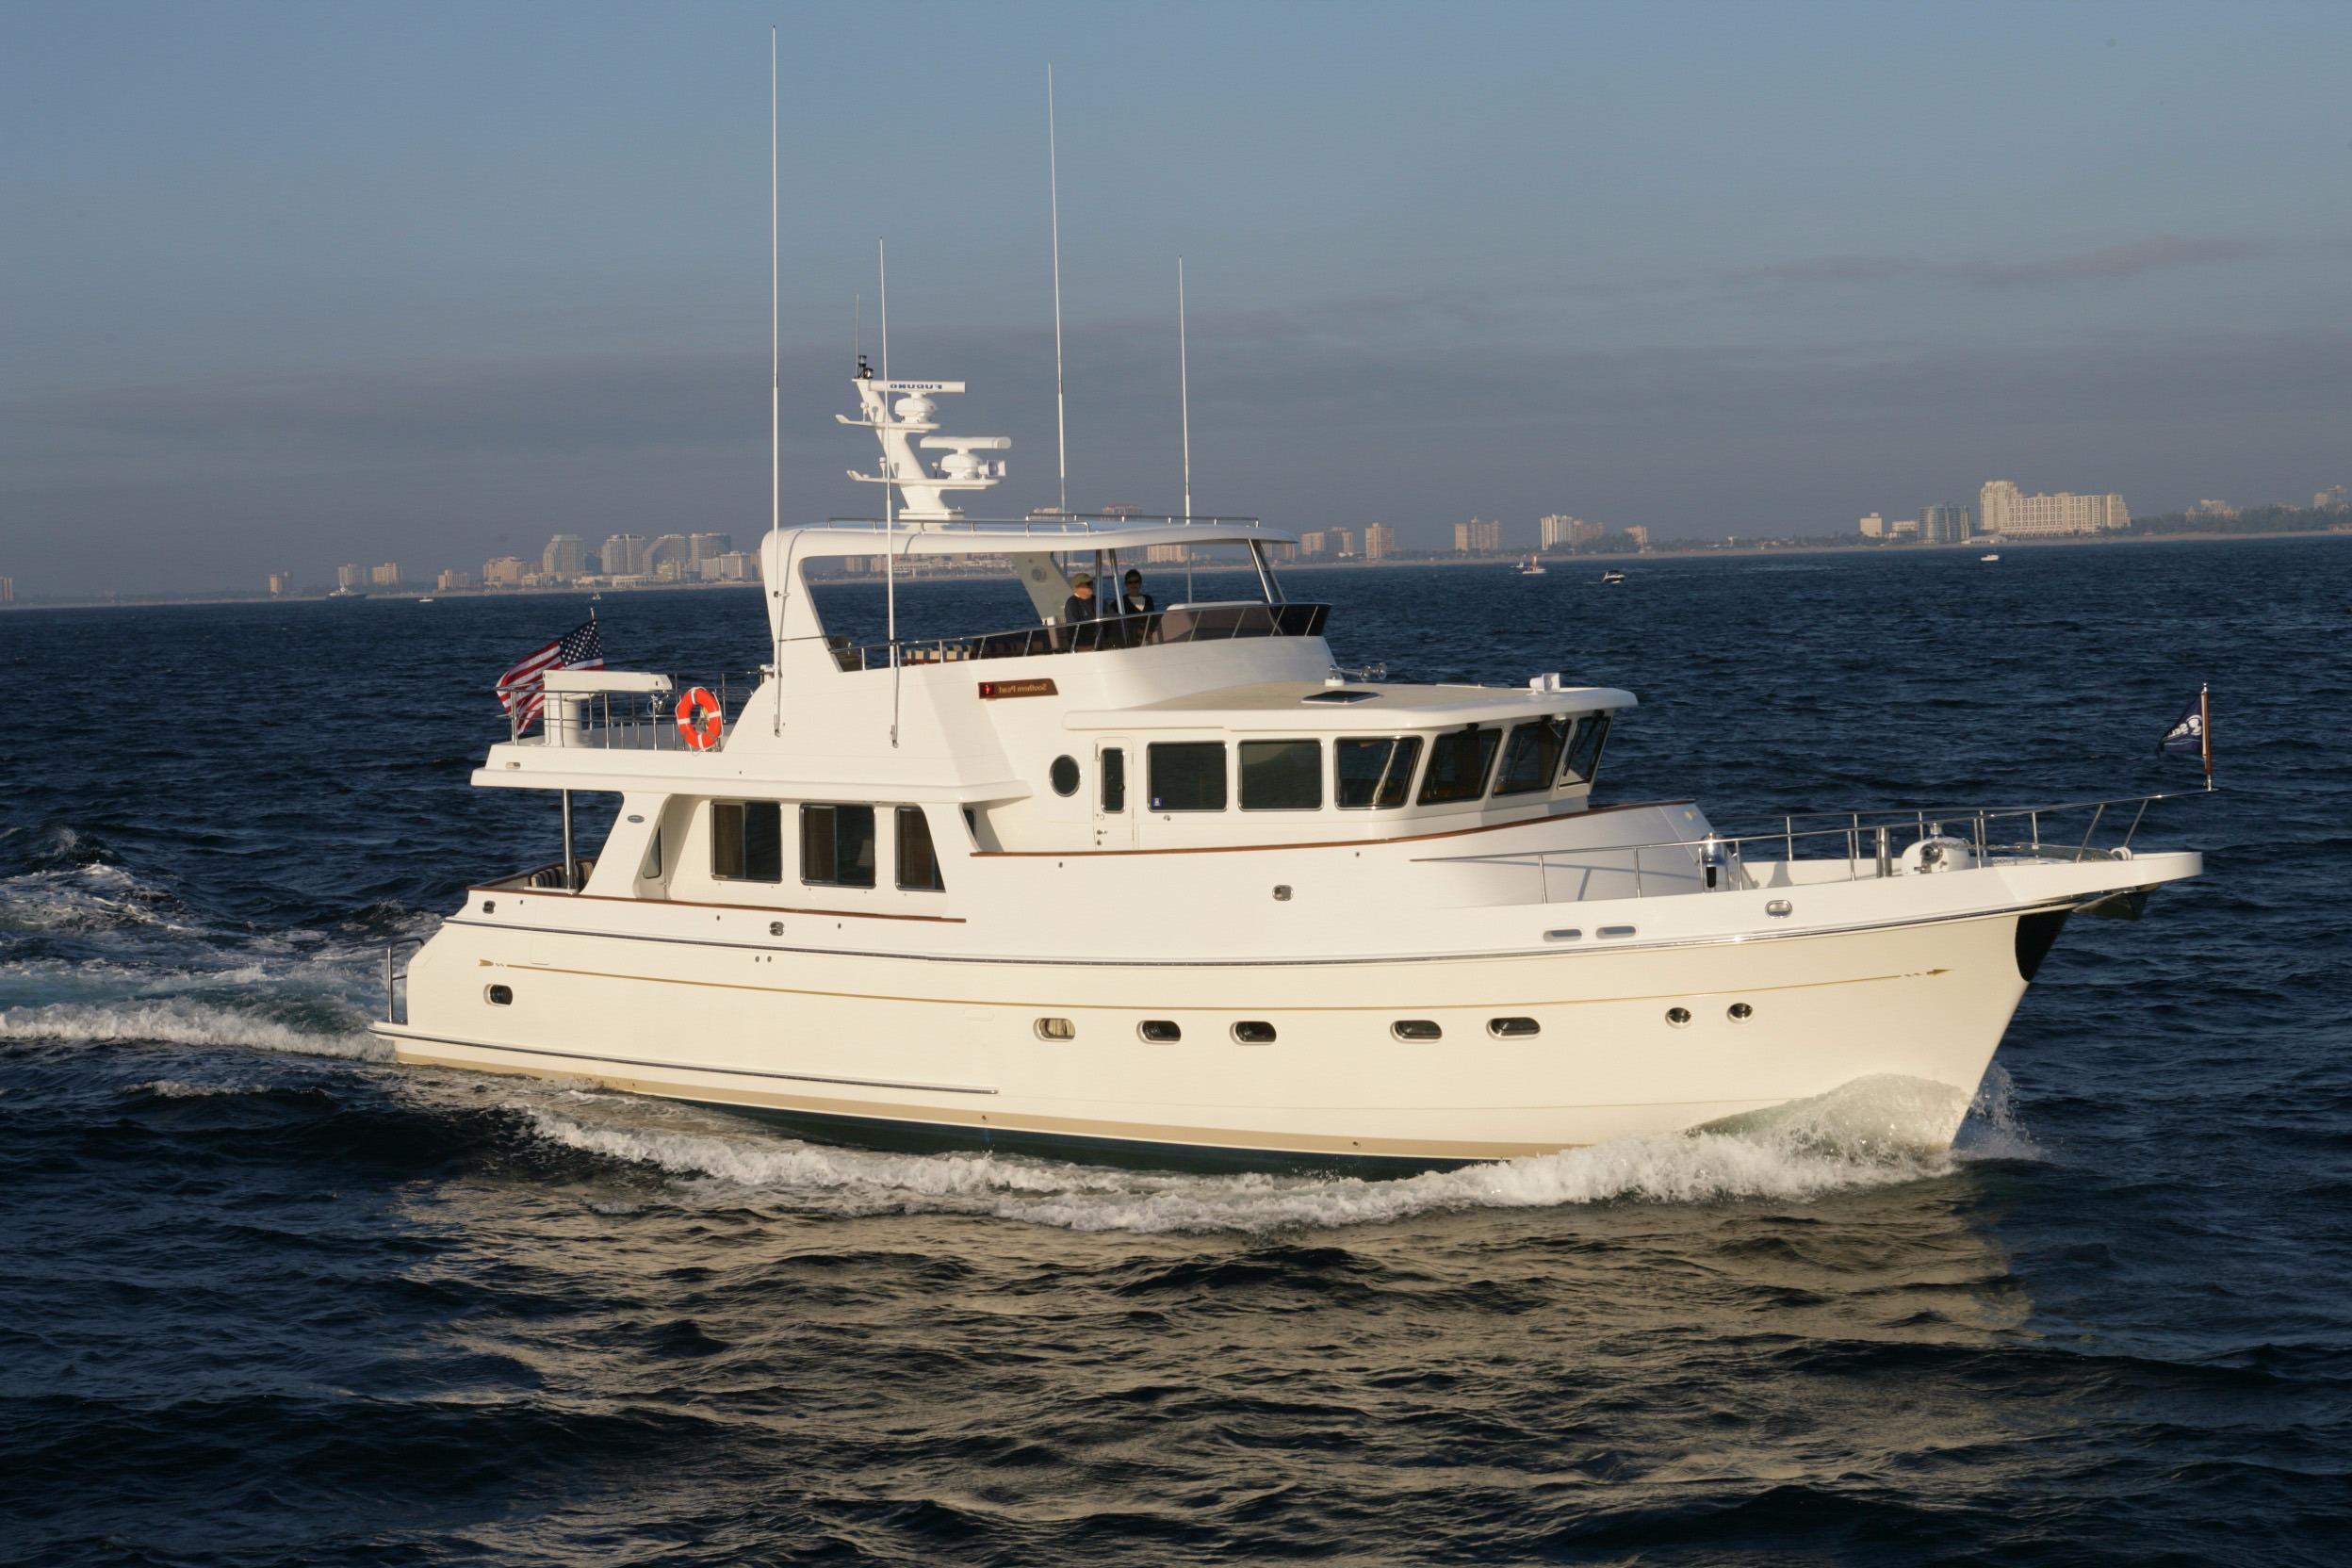 2008 Selene Selene 62 Power Boat For Sale Wwwyachtworldcom